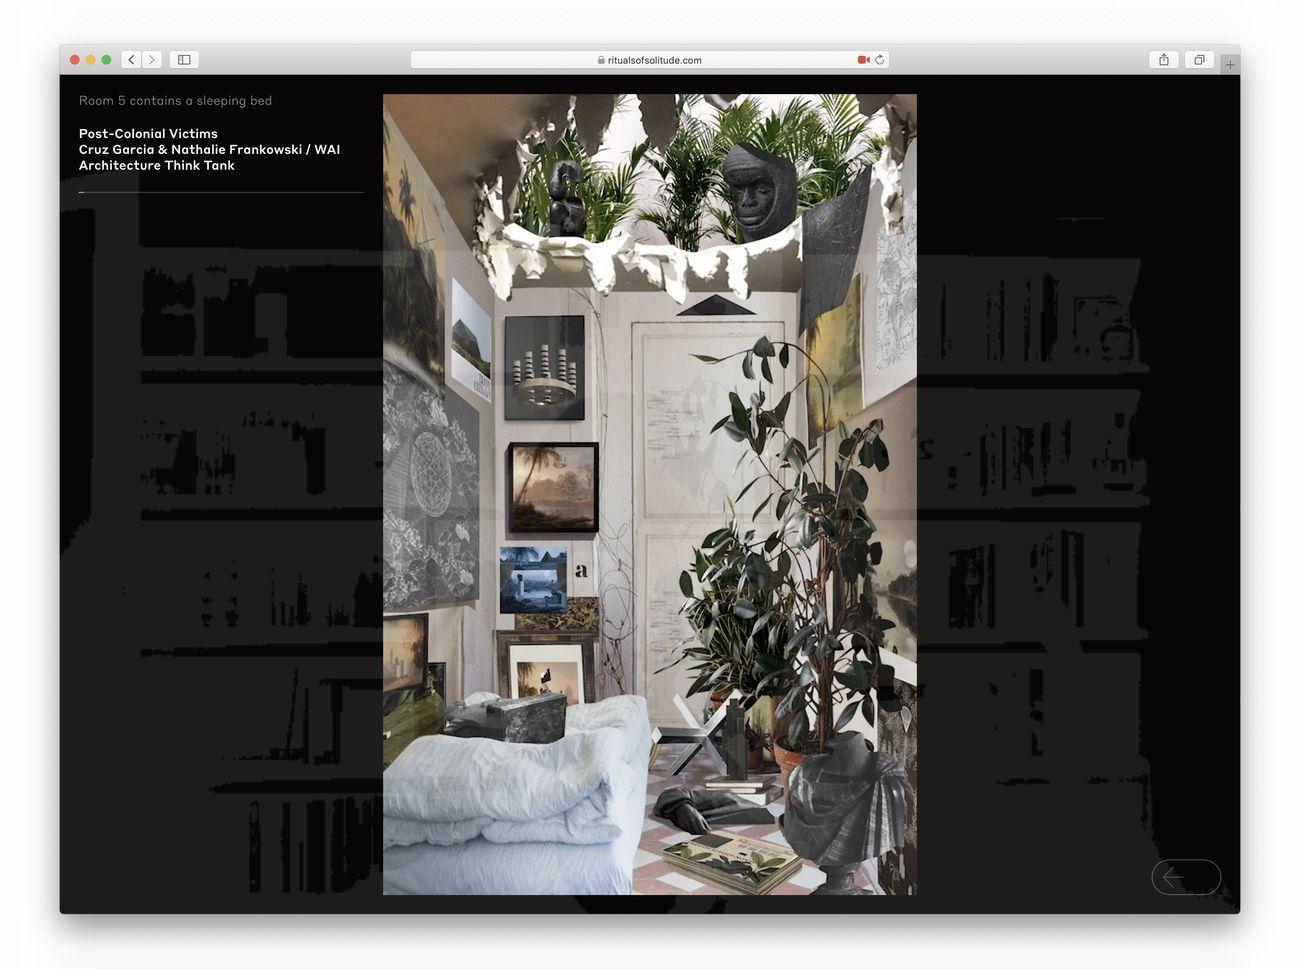 Cruz Garcia & Nathalie Frankowski – WAI Architecture Think Tank, Post Colonial Victims, 2020, video © Unfolding Pavilion – WAI Architecture Think Tank